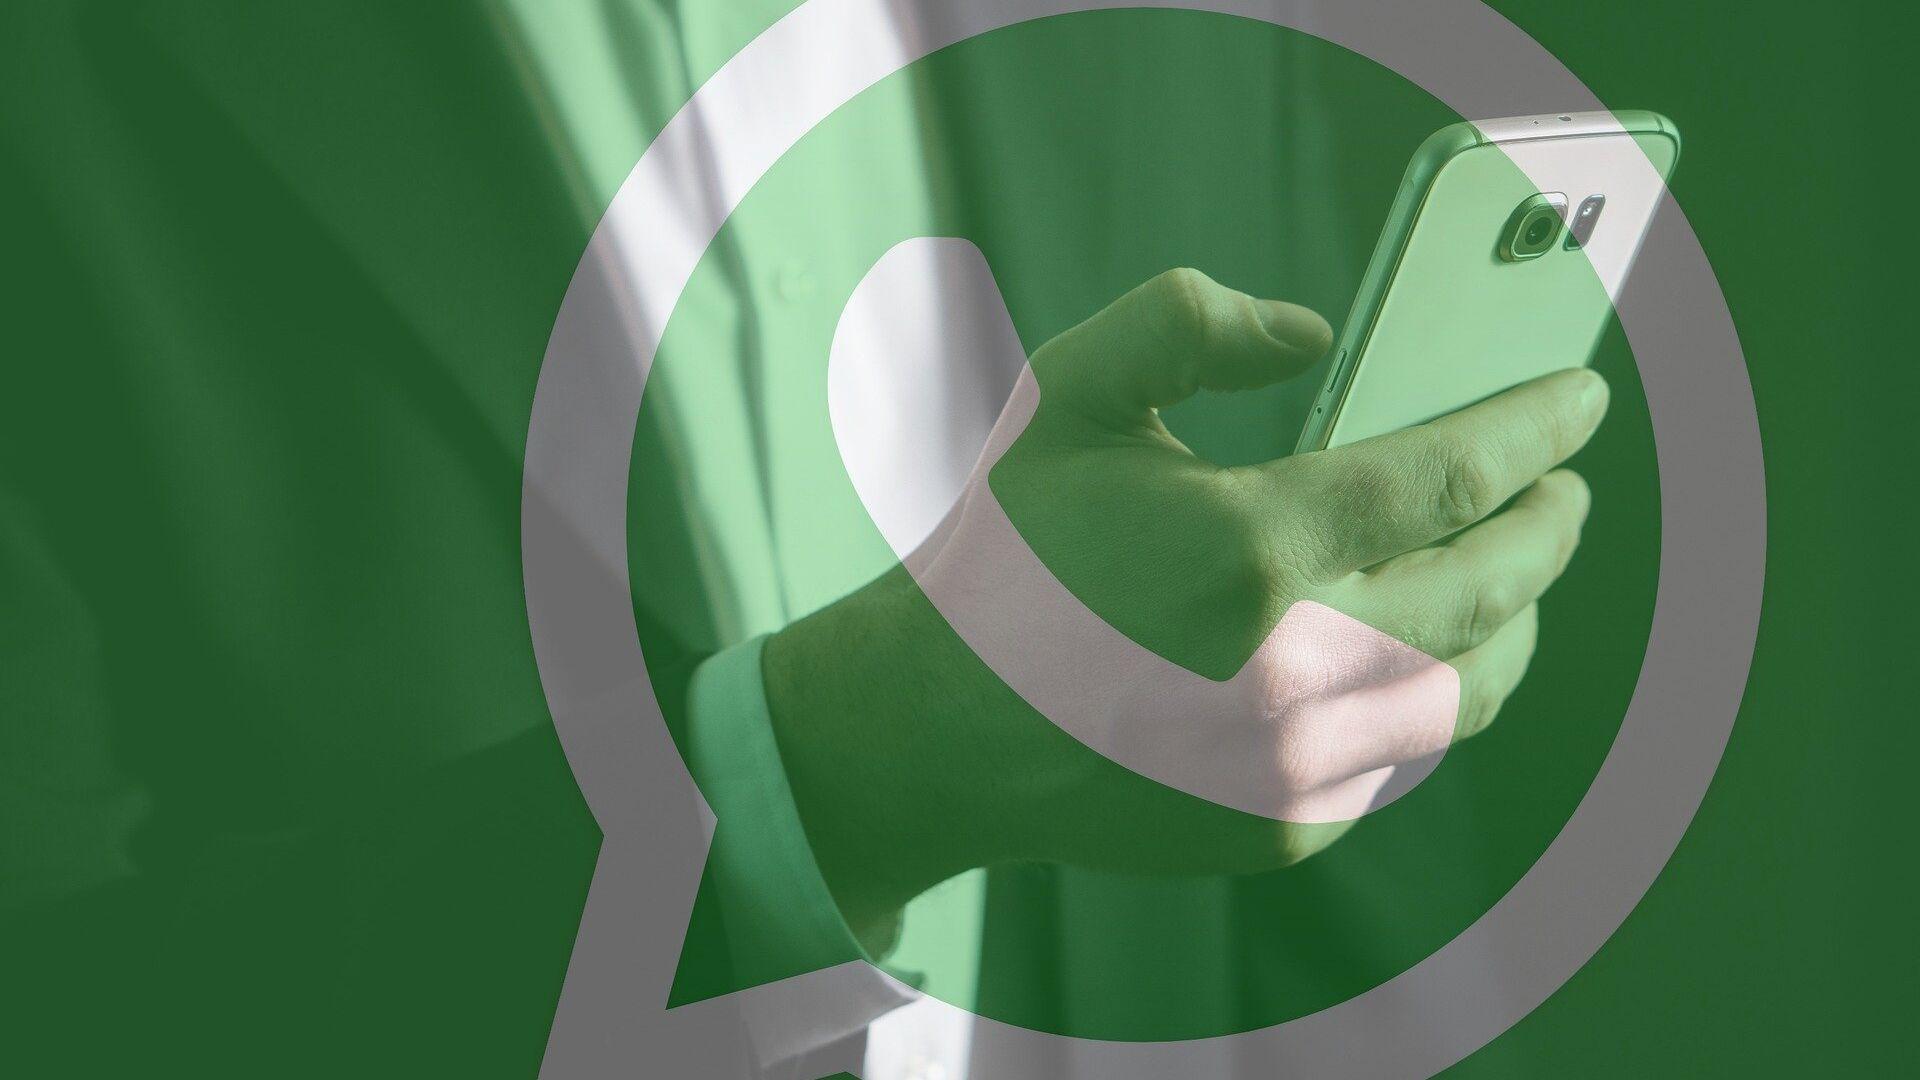 El logo de WhatsApp - Sputnik Mundo, 1920, 12.07.2021